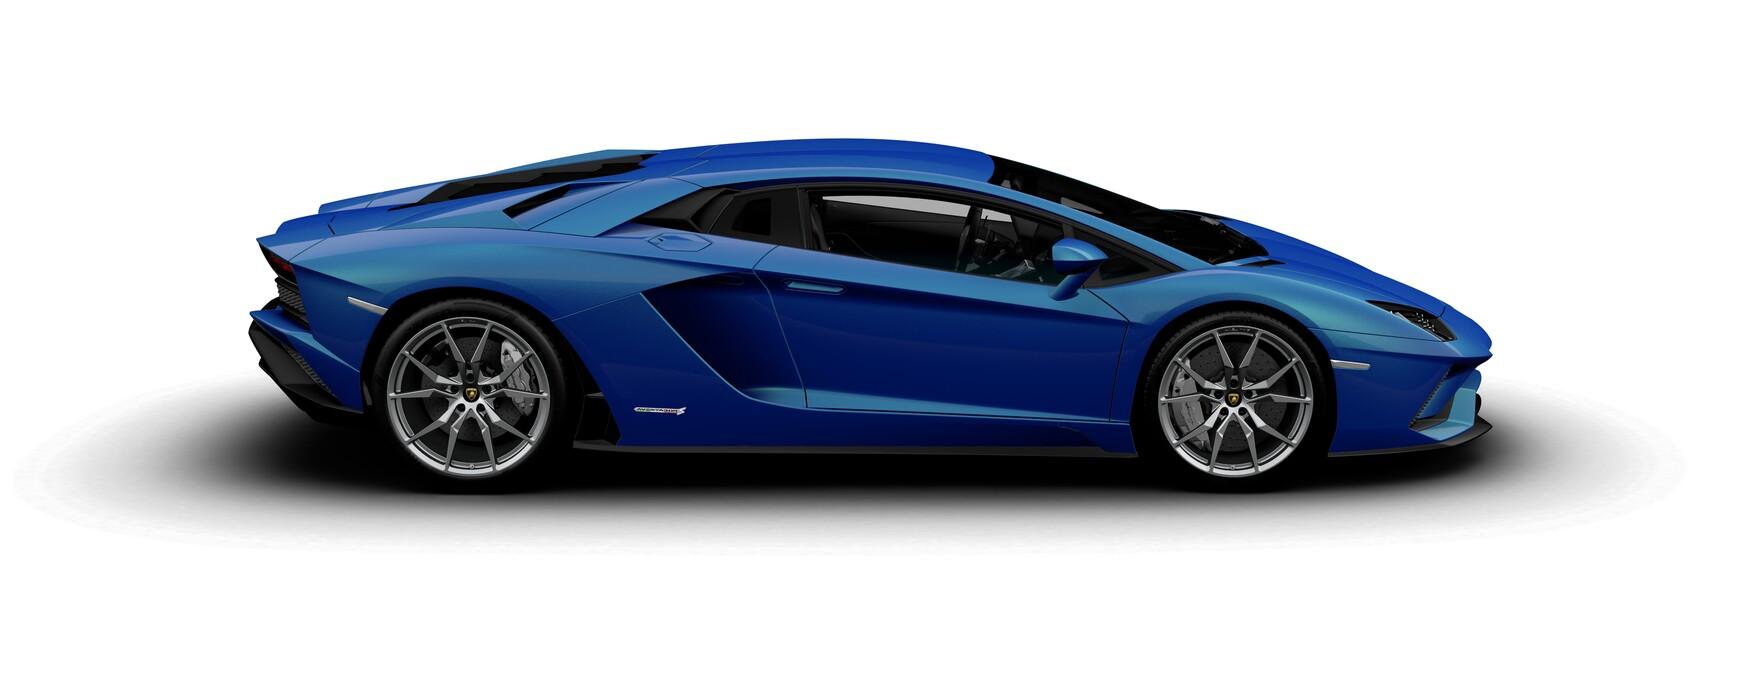 Lamborghini Aventador S Coupe metallic Blu Nethuns side view